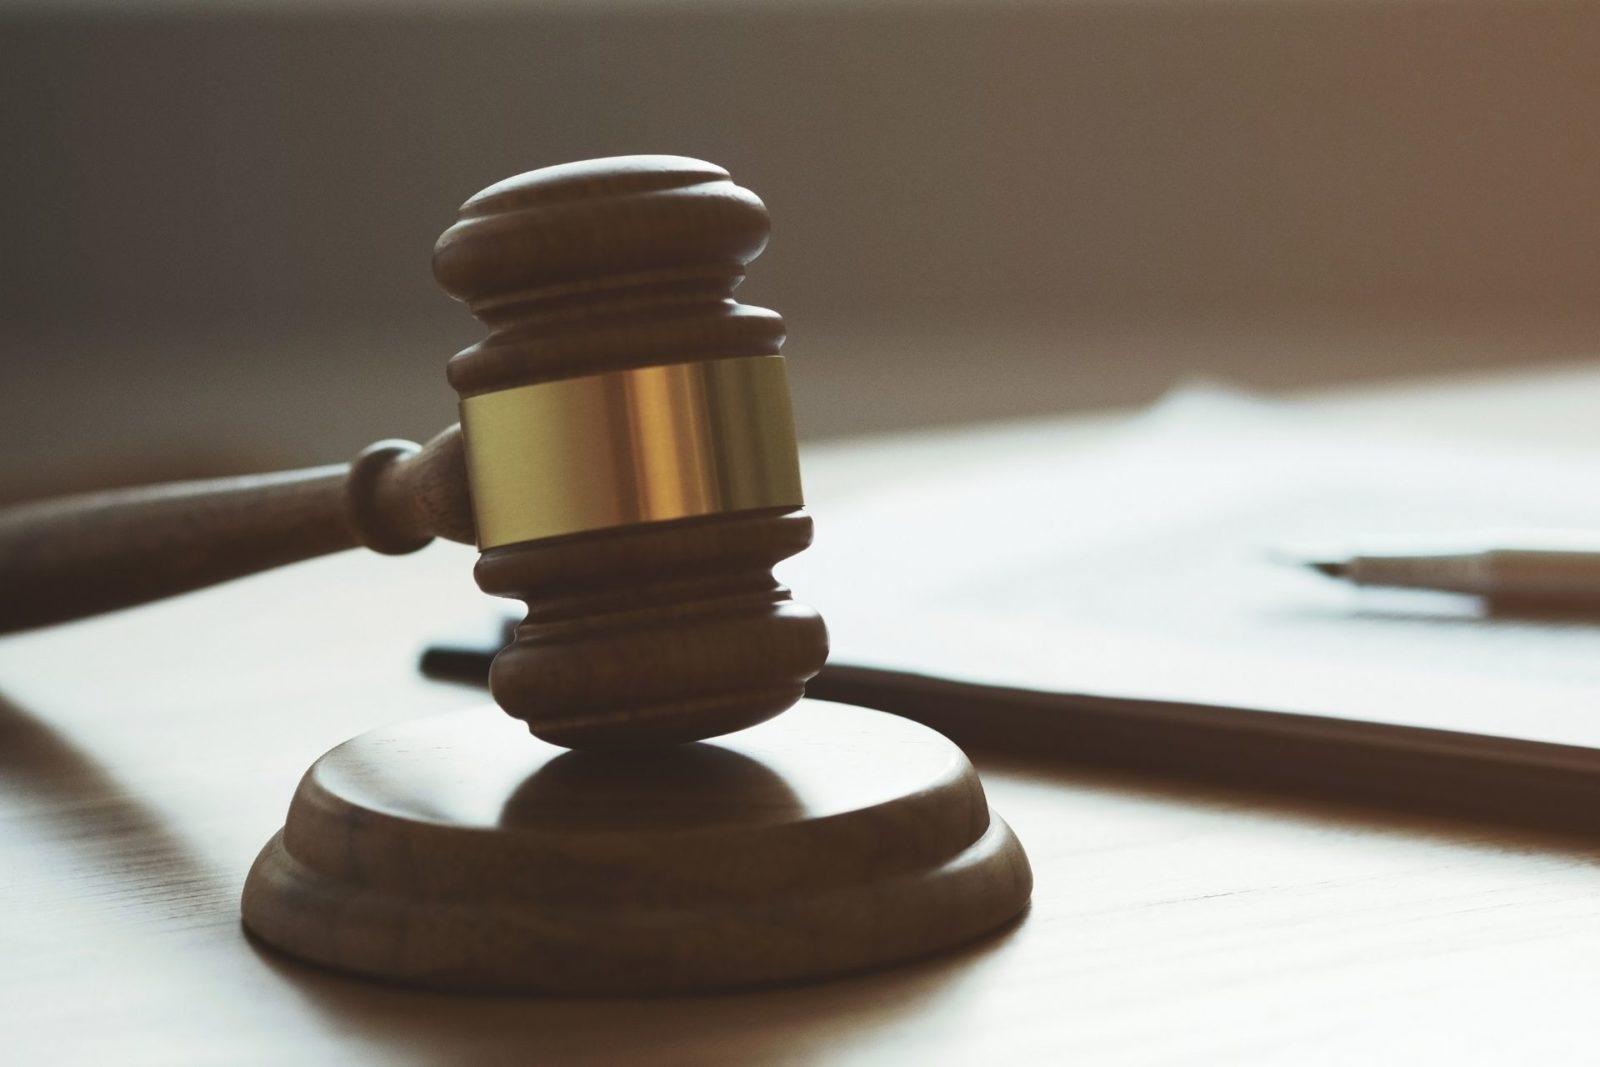 martelo justica processo civil governo significado de precatorio precato